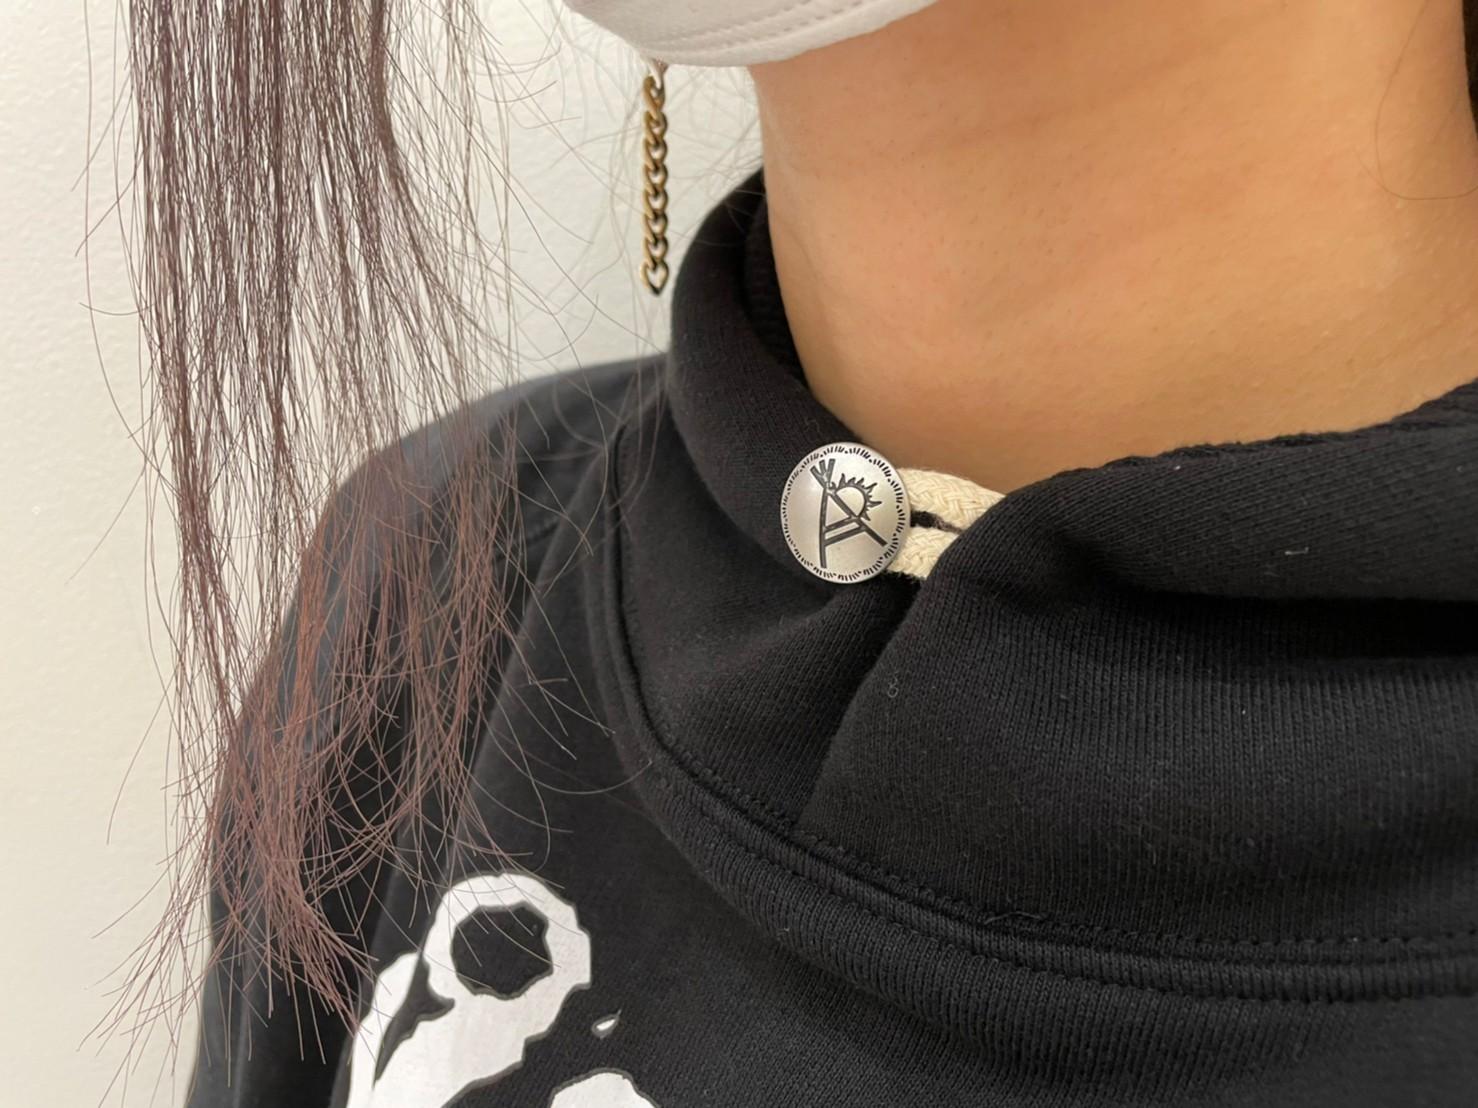 LINE_ALBUM_10.15あみブログ_211013_4